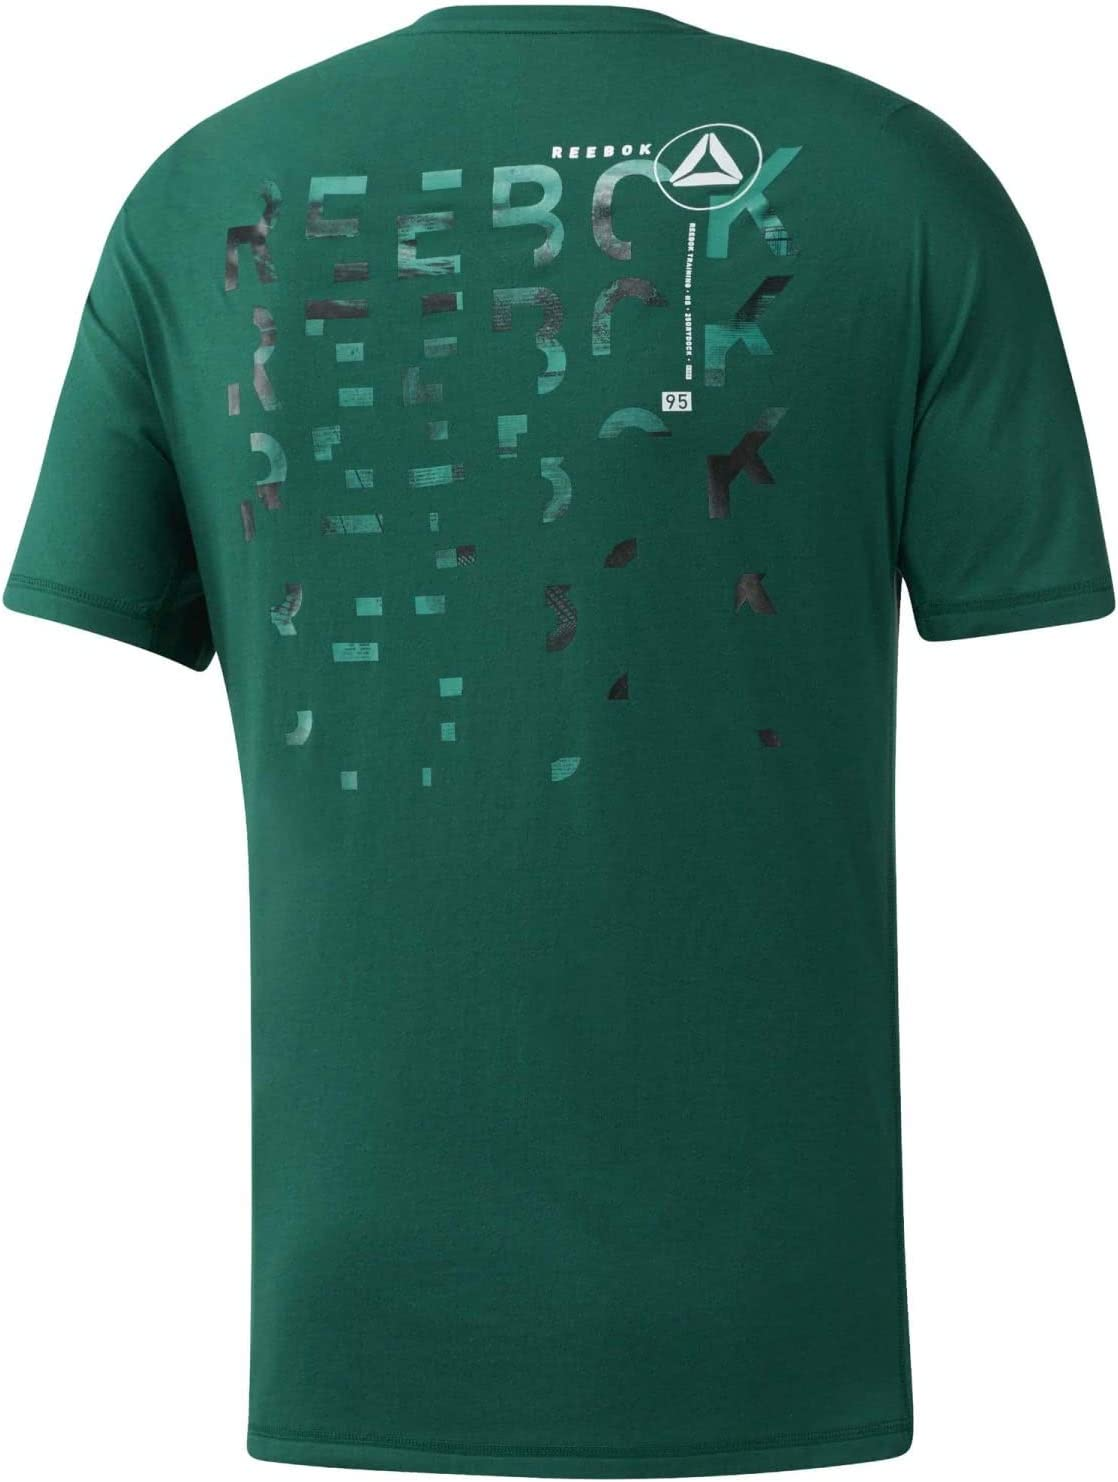 Silber Reebok Herren One Series Training Speedwick T-Shirt Gr/ün